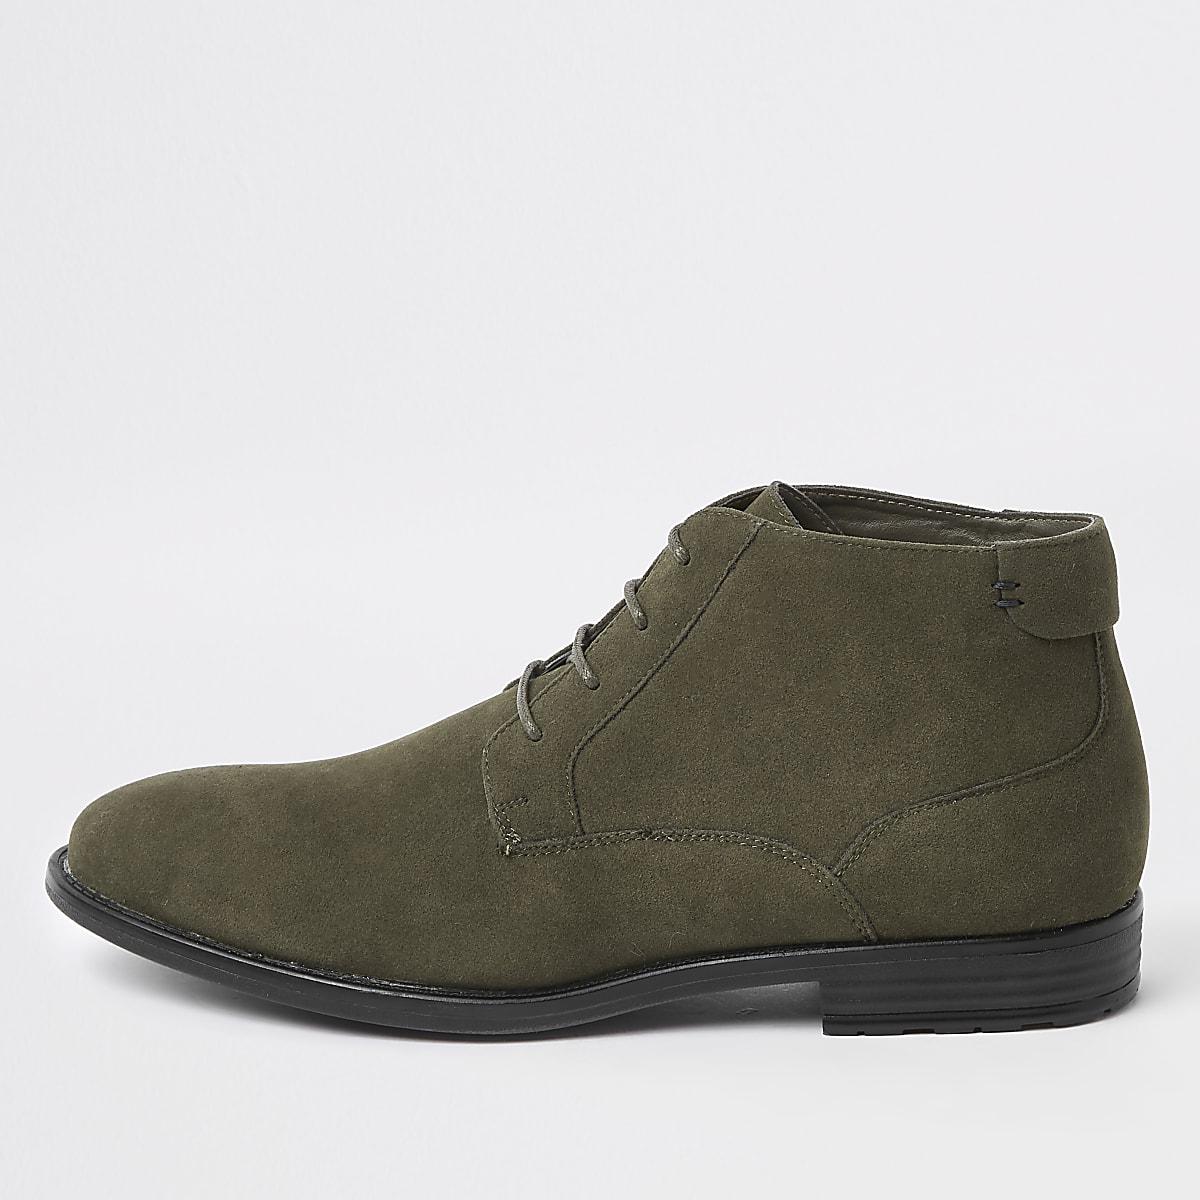 Dark green eyelet desert boots